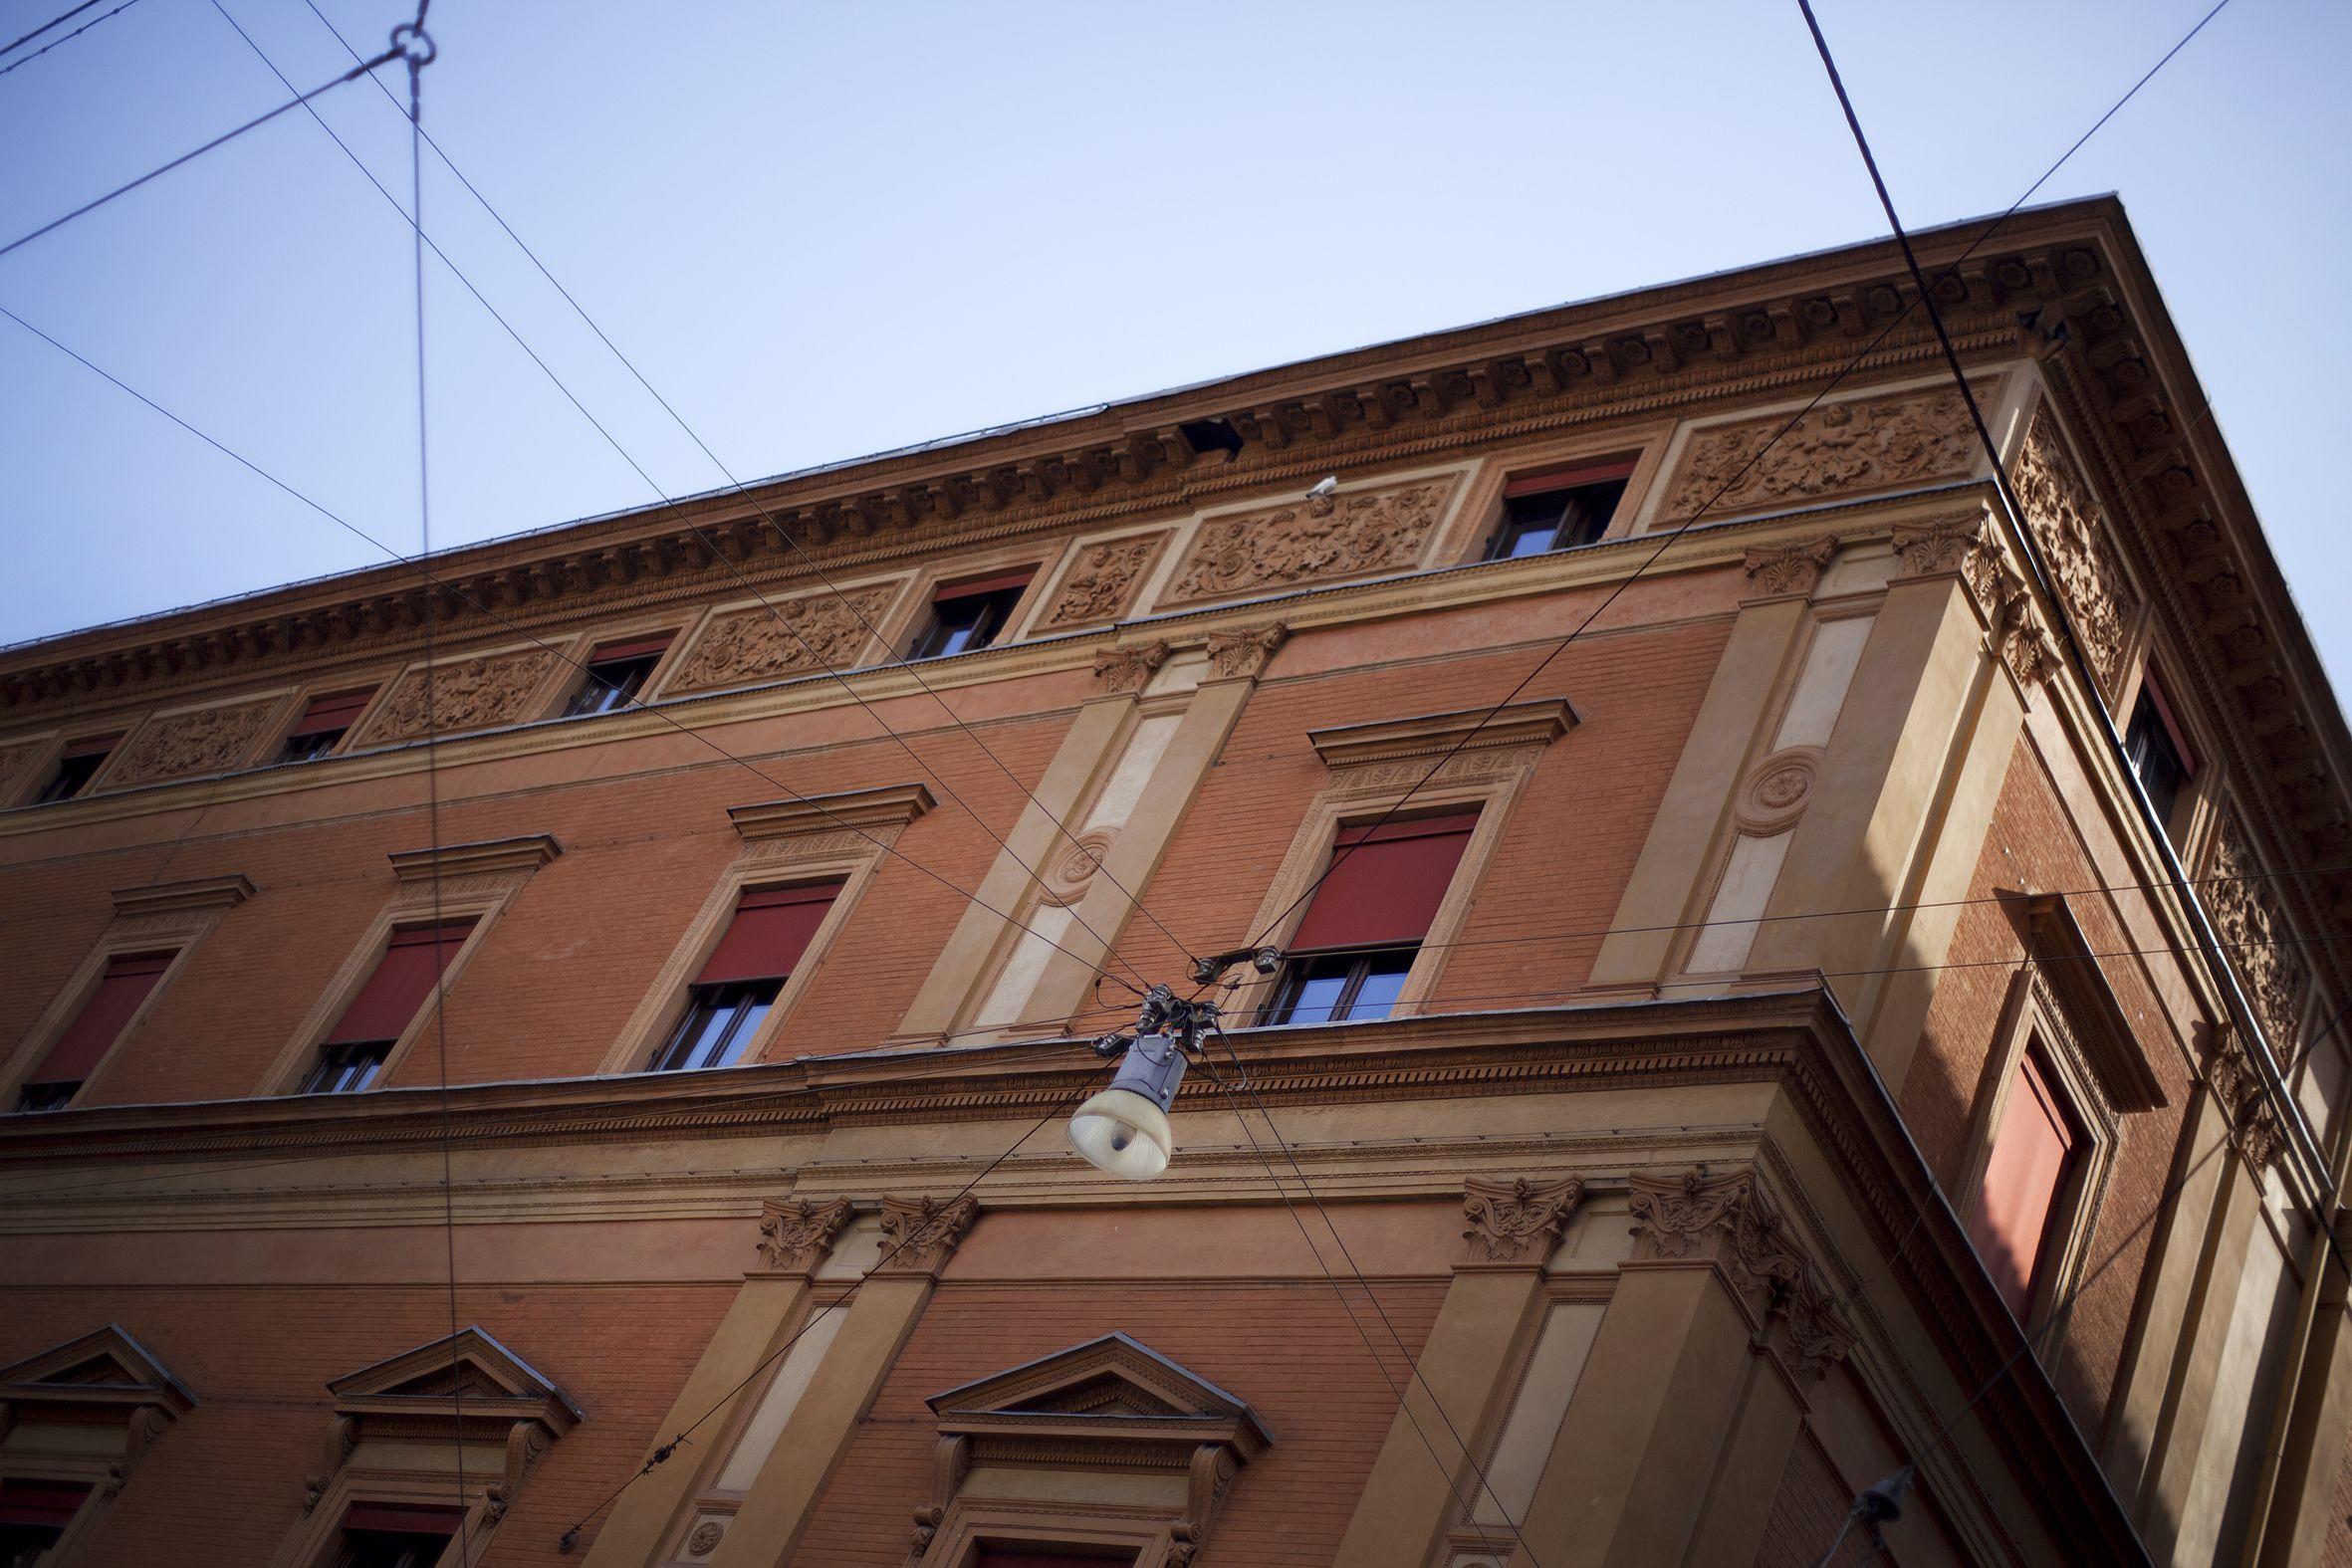 Bologna ©Silvia Fabbri